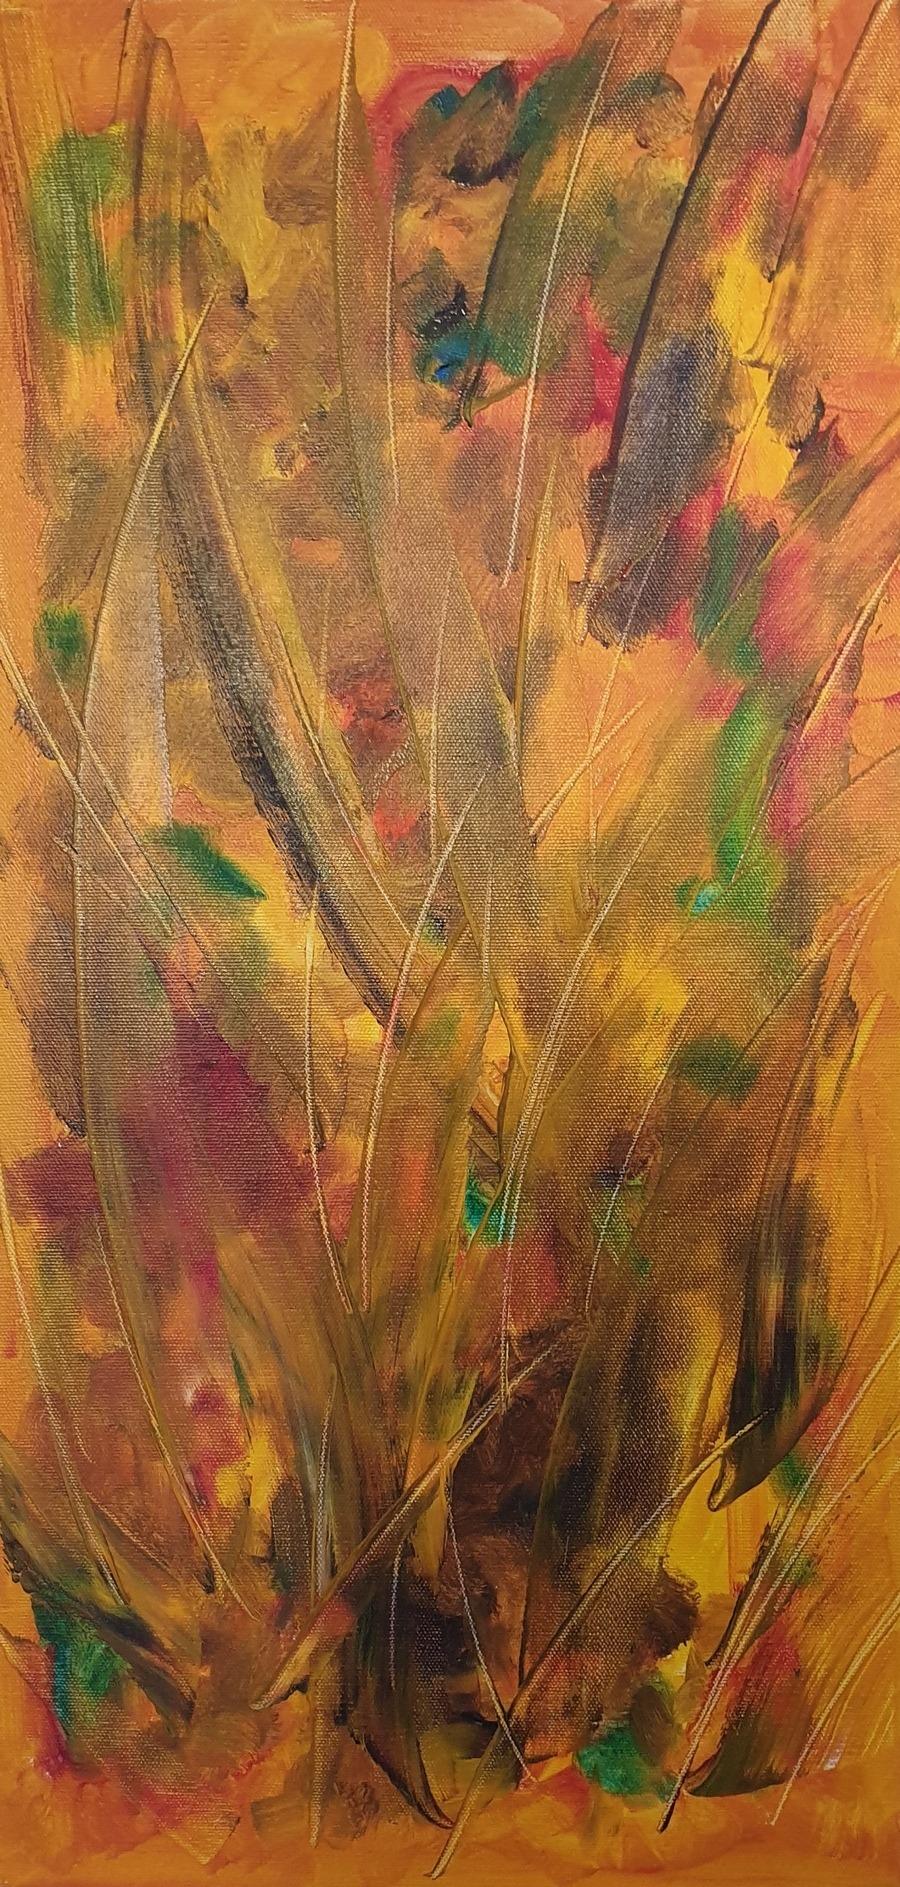 L'Allumage du Feu - Painting by Gavin Colgne-Brookes